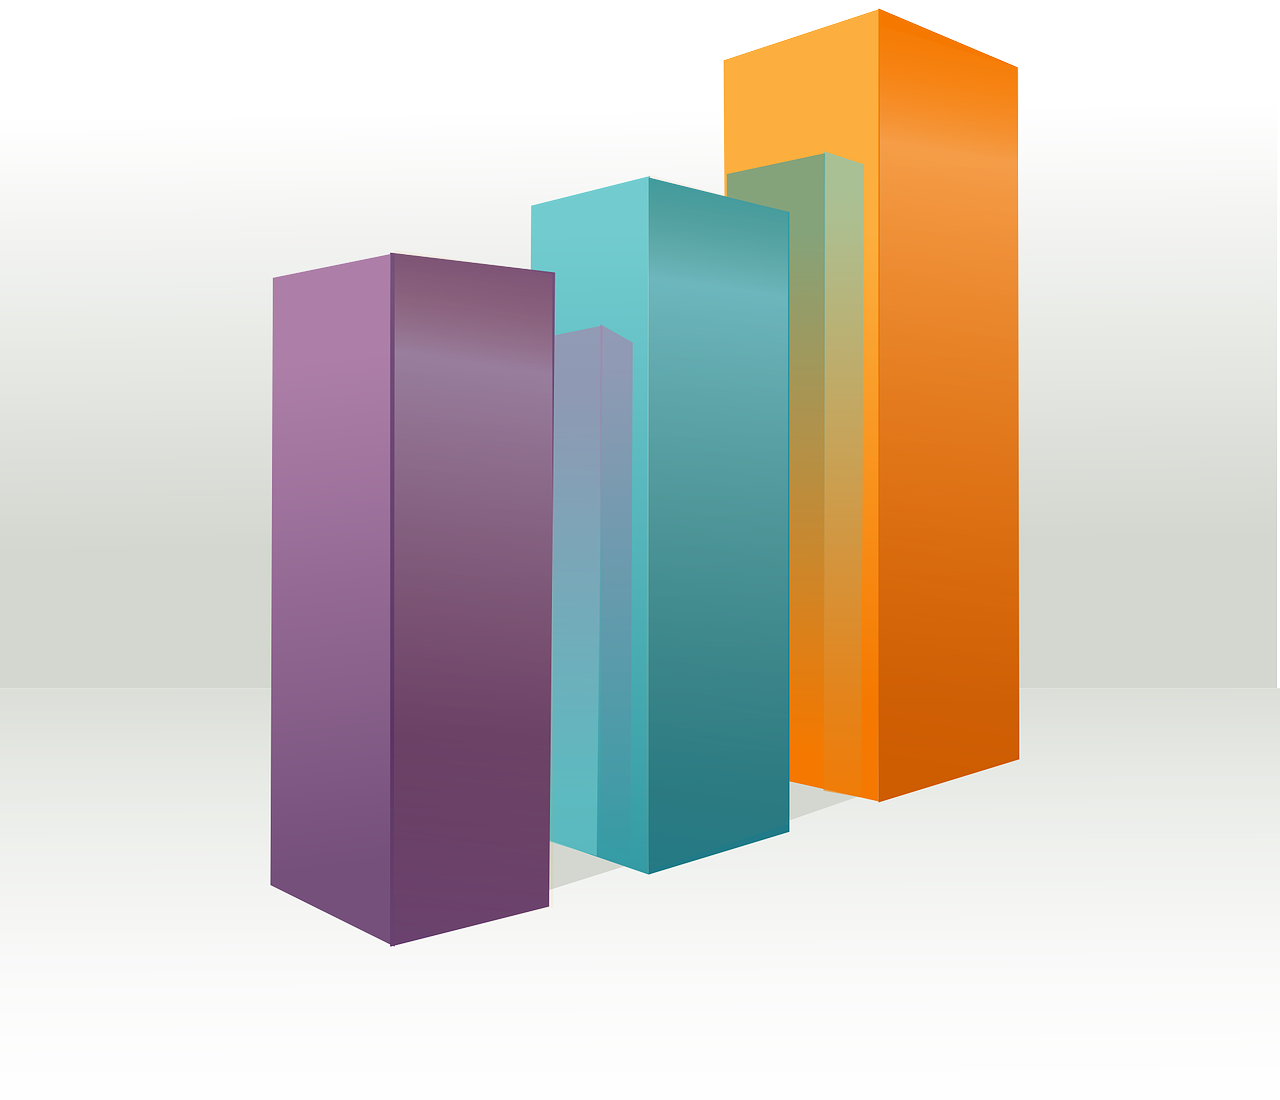 bar-charts